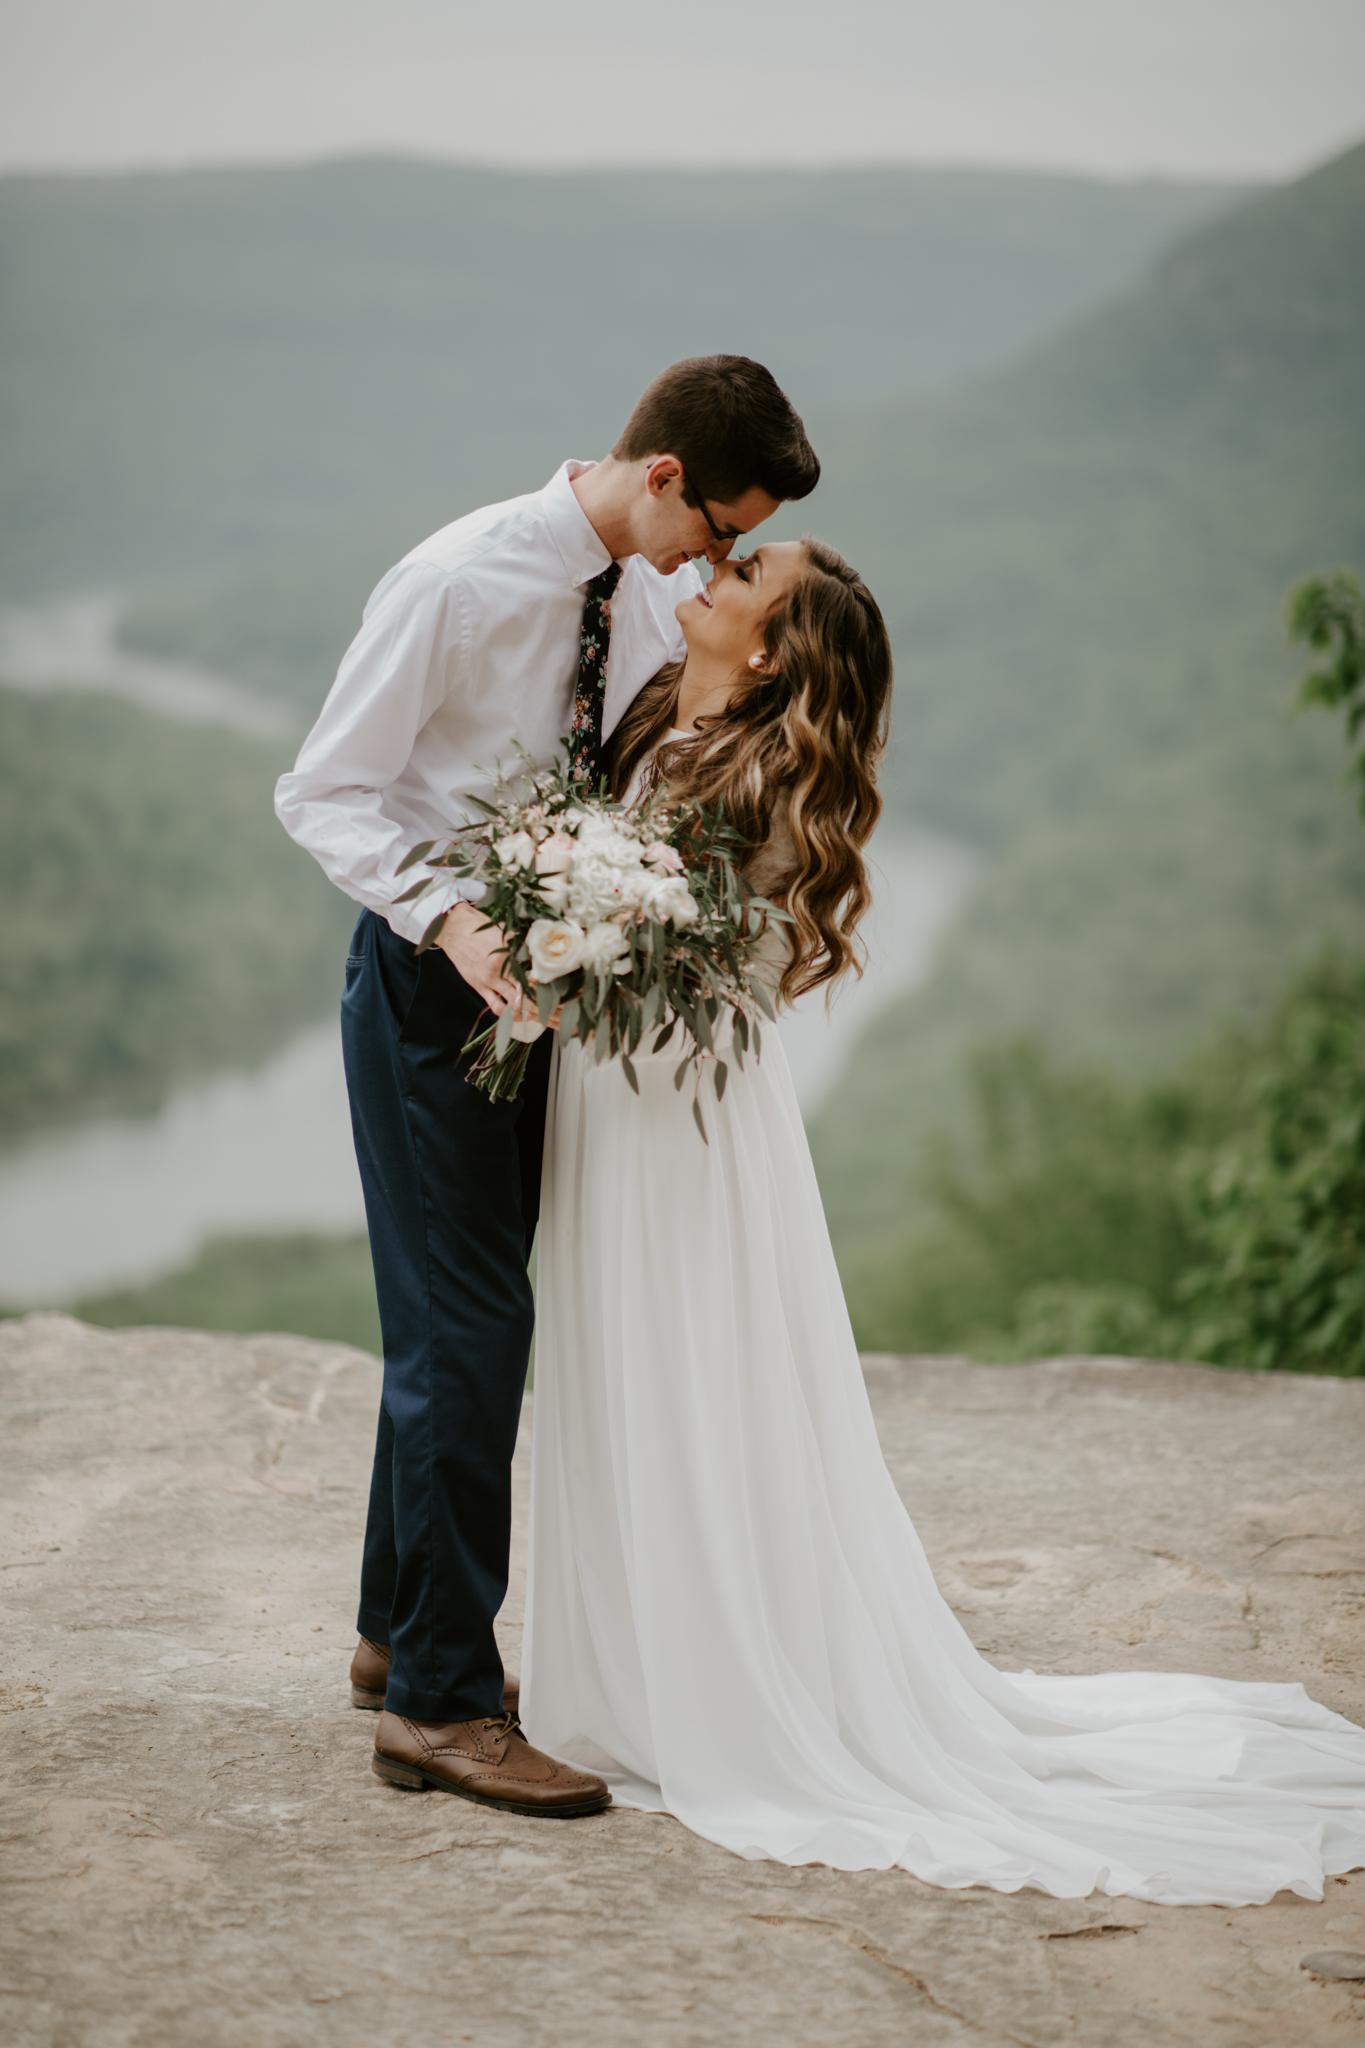 Lacey-Joe-Chattanooga-Nashville-Tennessee-Wedding-Elopement-Photographer-6.jpg